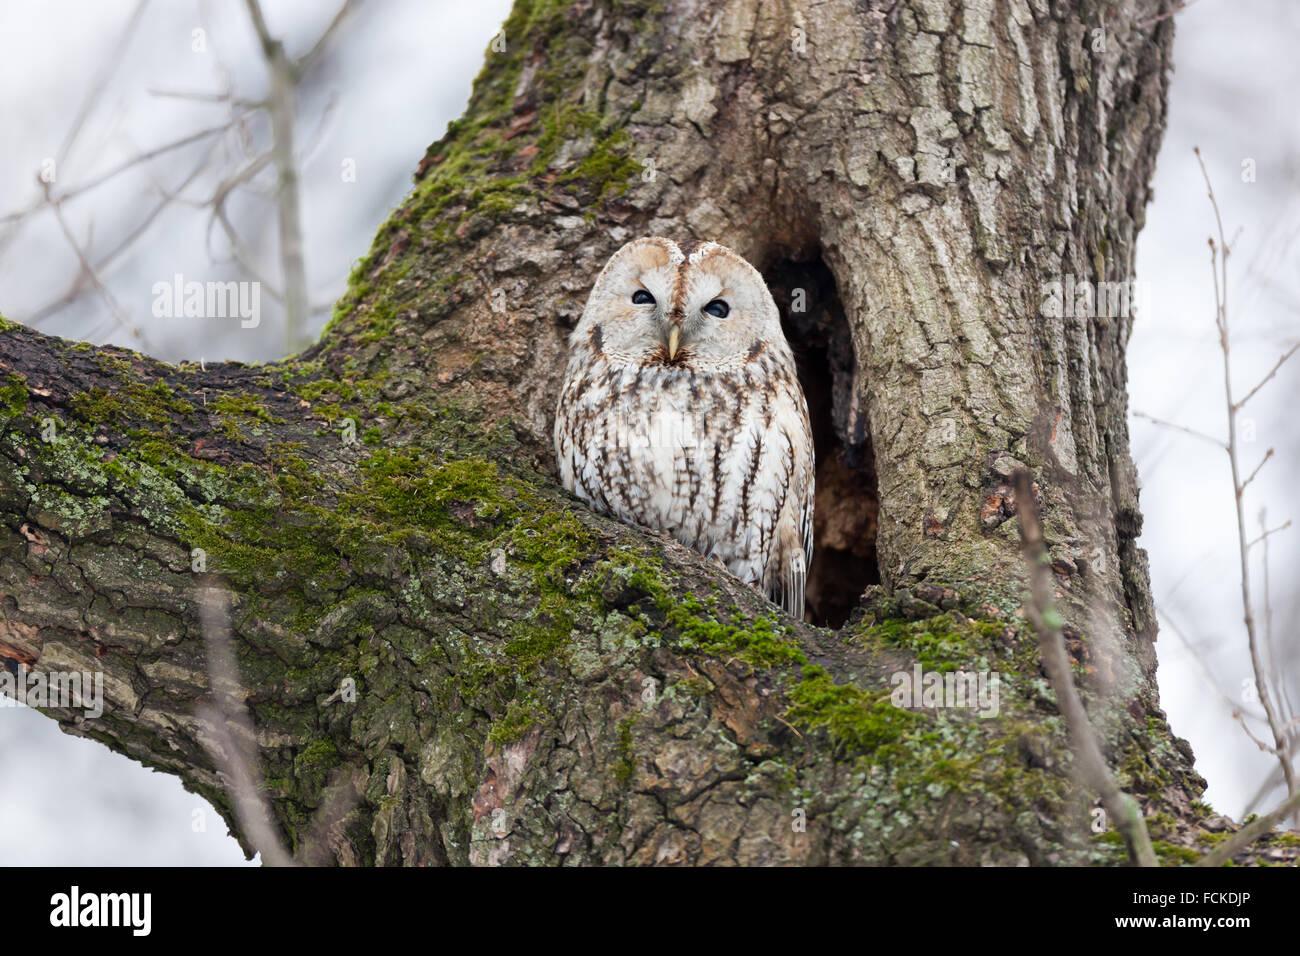 Tawny Owl (Strix aluco). Moscow. Russia. - Stock Image